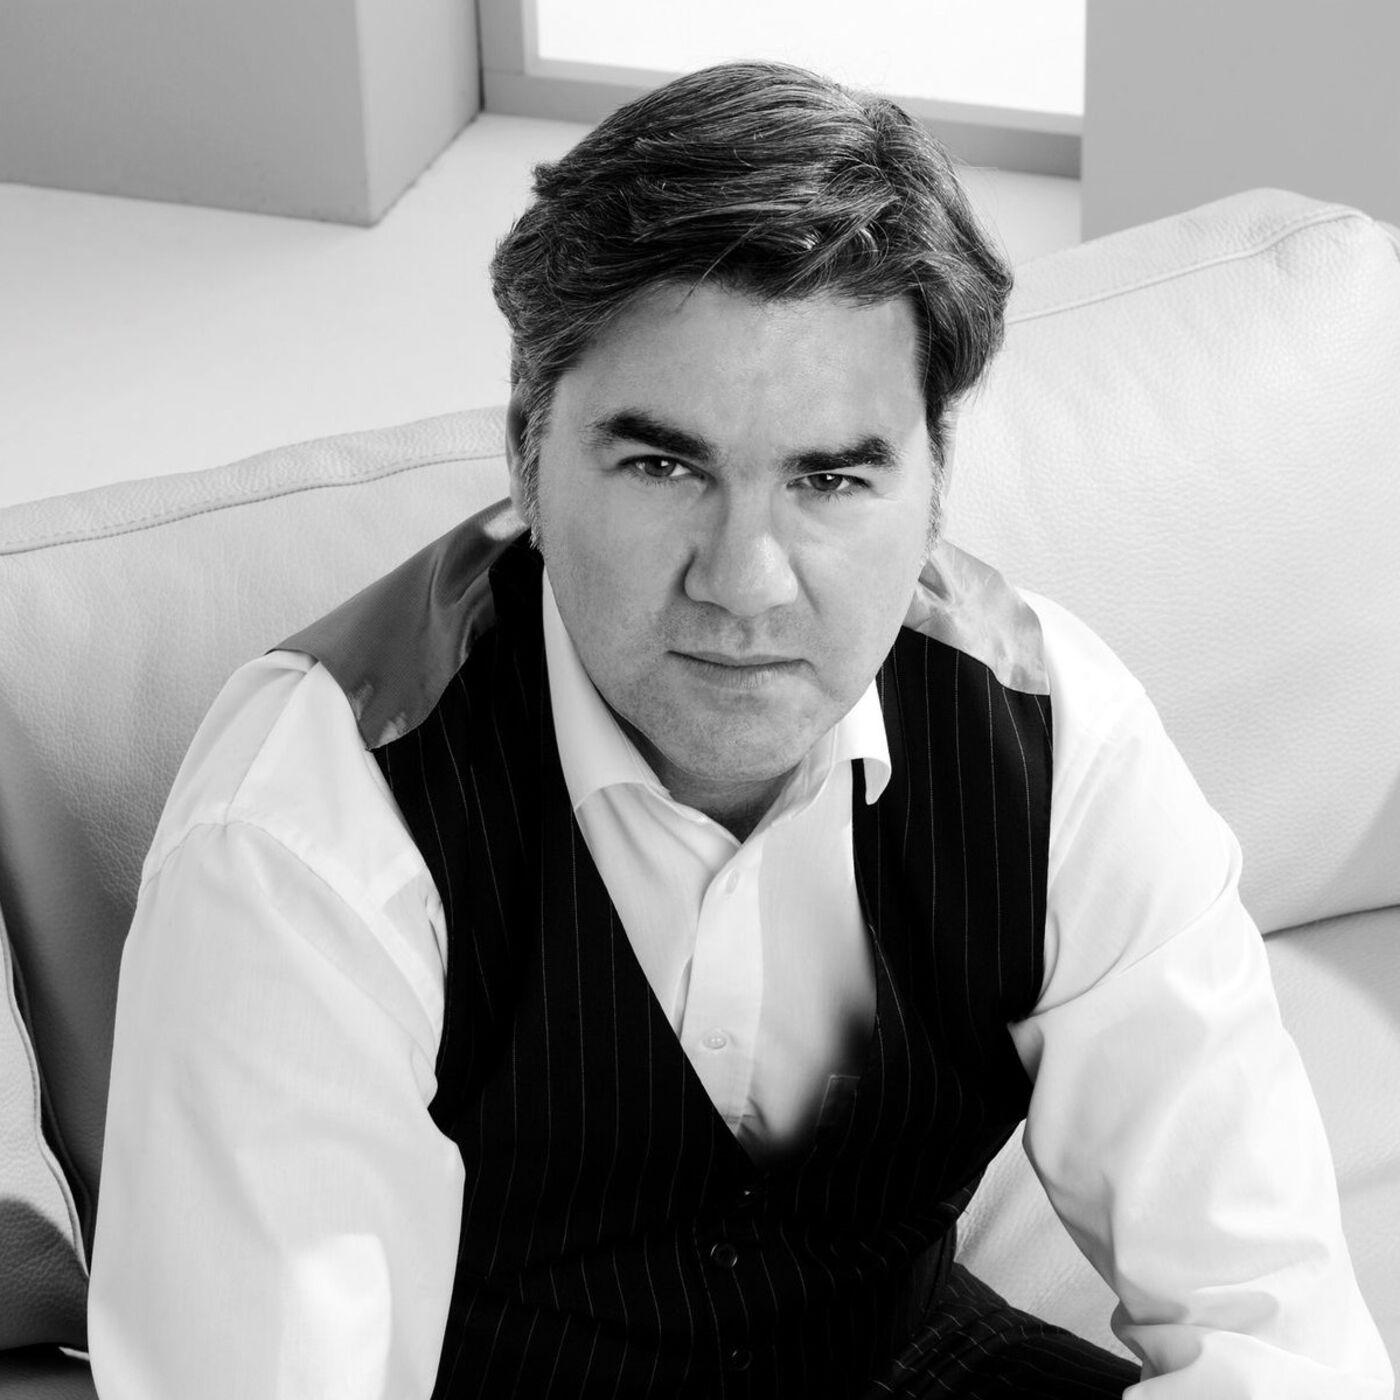 Paul Adrian, Founder of MOJO Hair